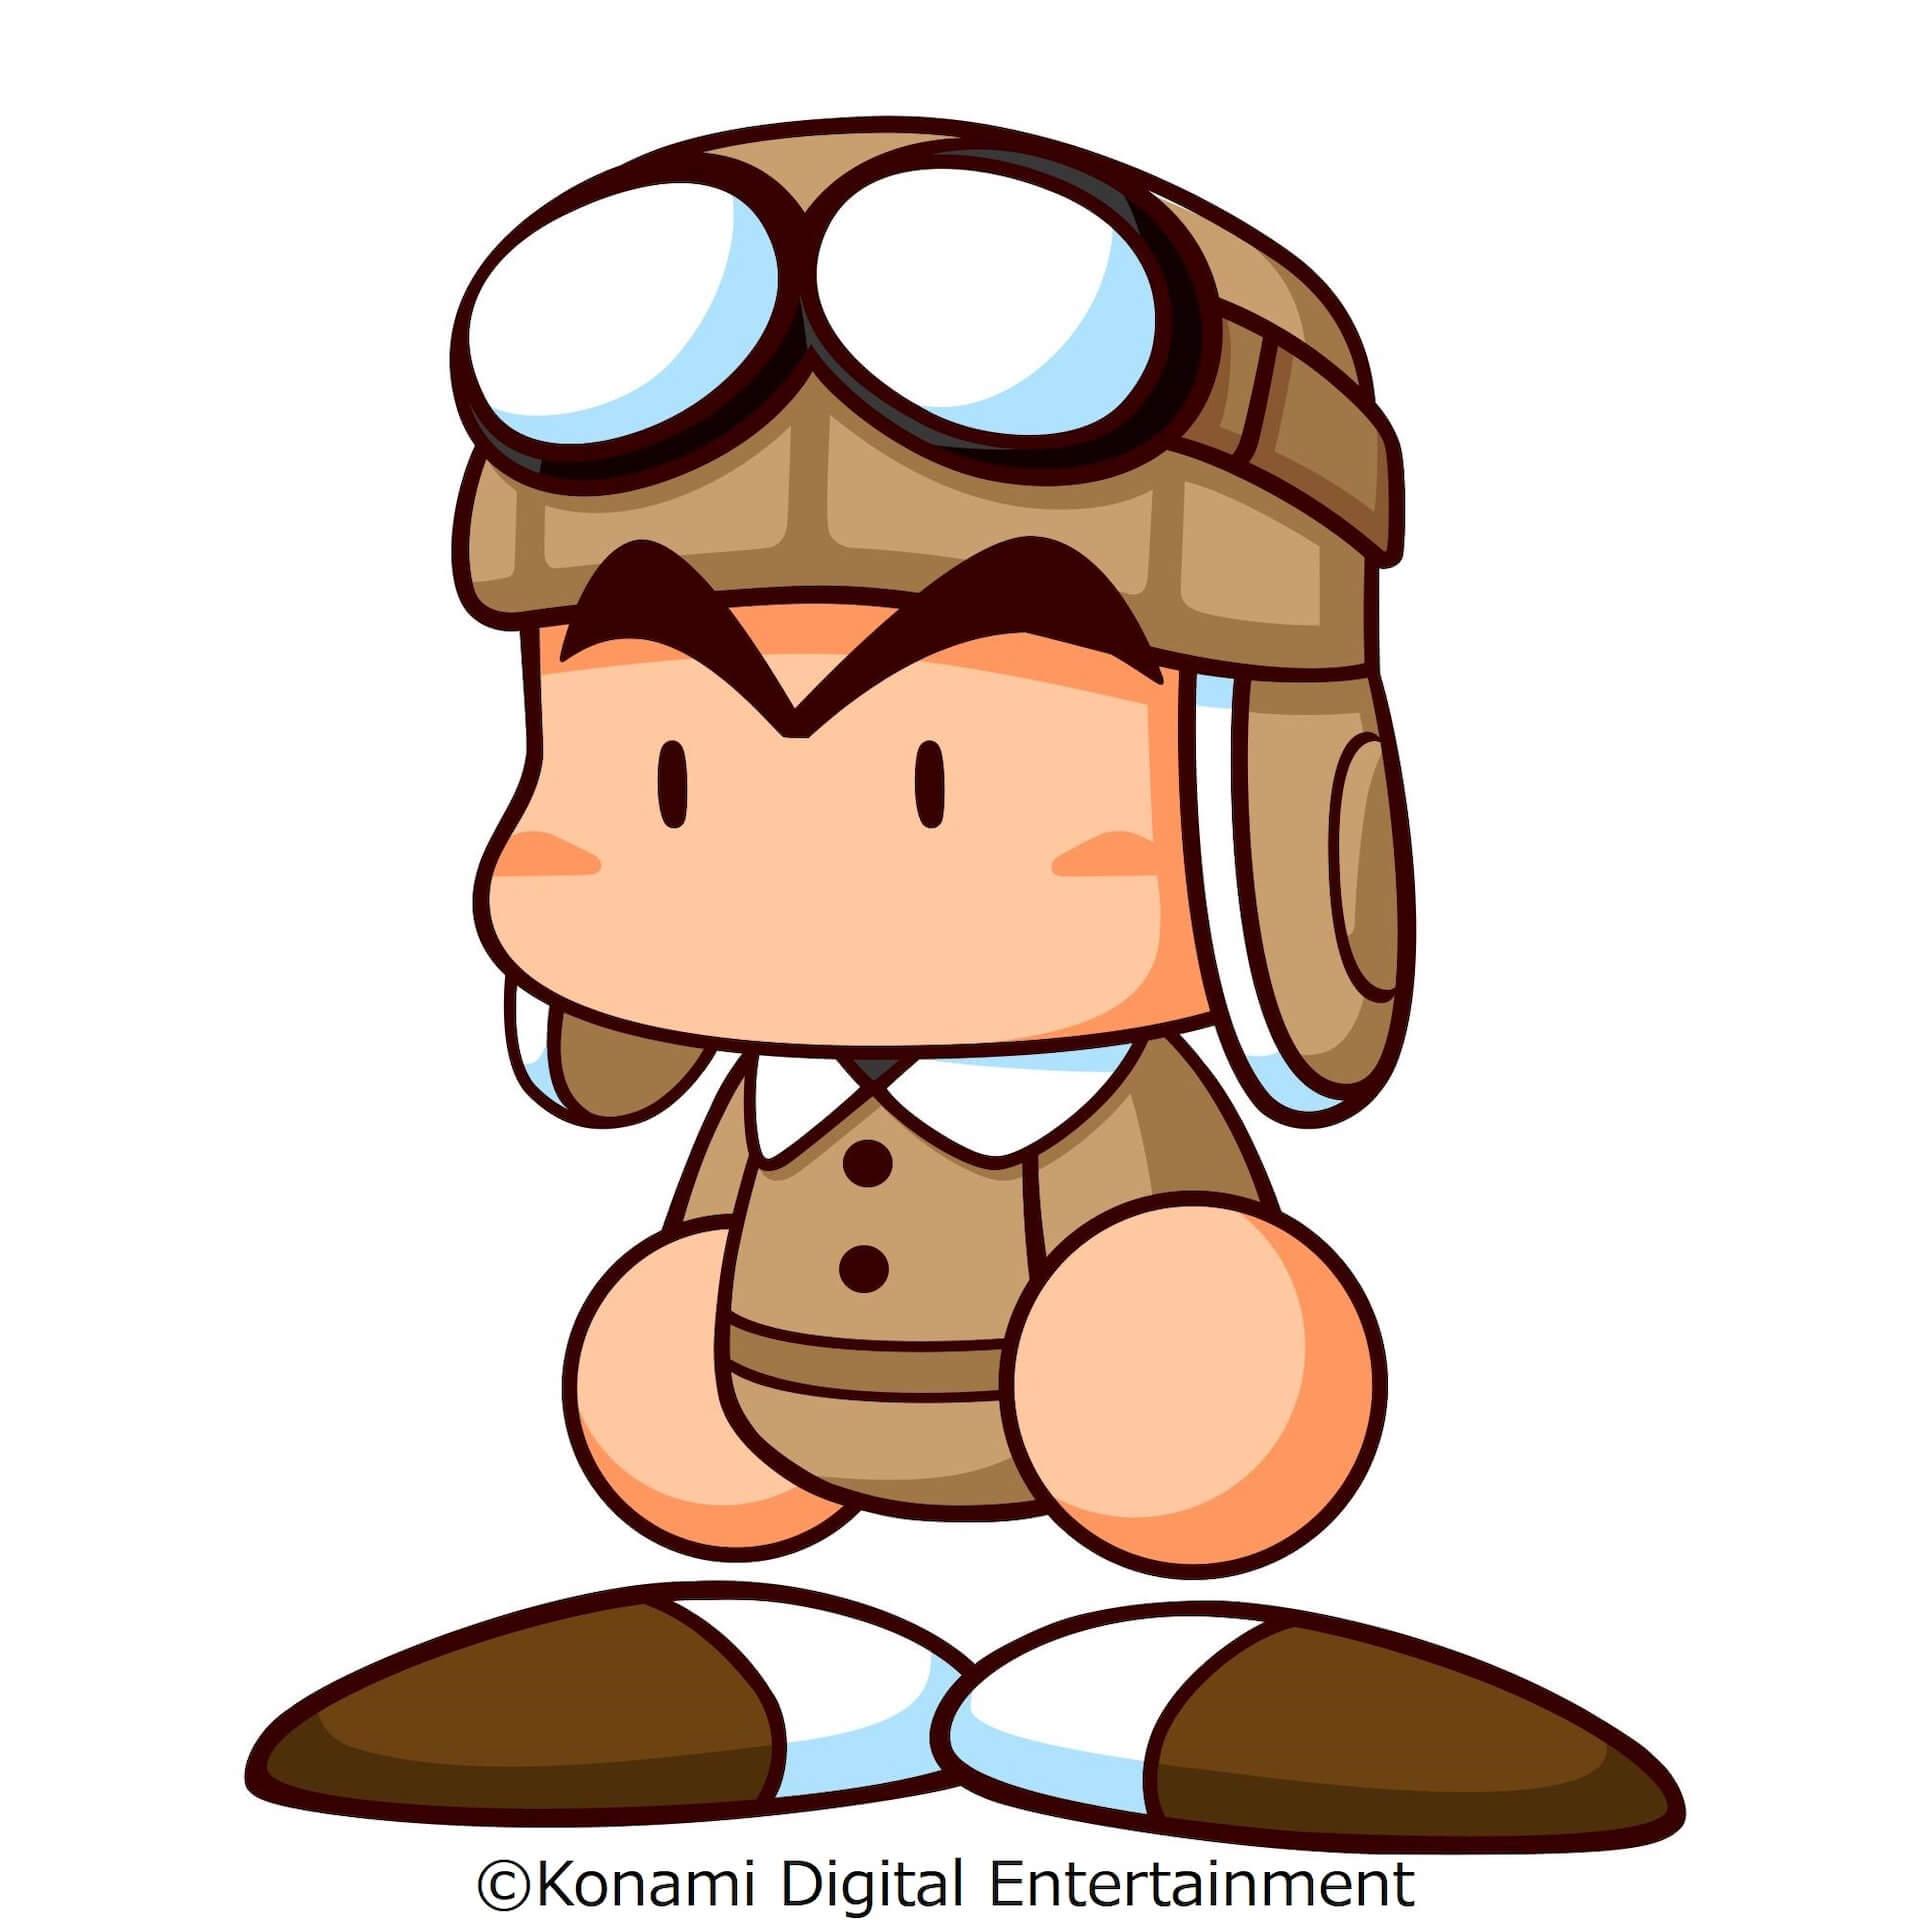 Nintendo Switch『パワプロクンポケットR』の発売日が11月25日に決定!DLCパワポケダッシュも早期購入特典に tech210805_pawapoker_13